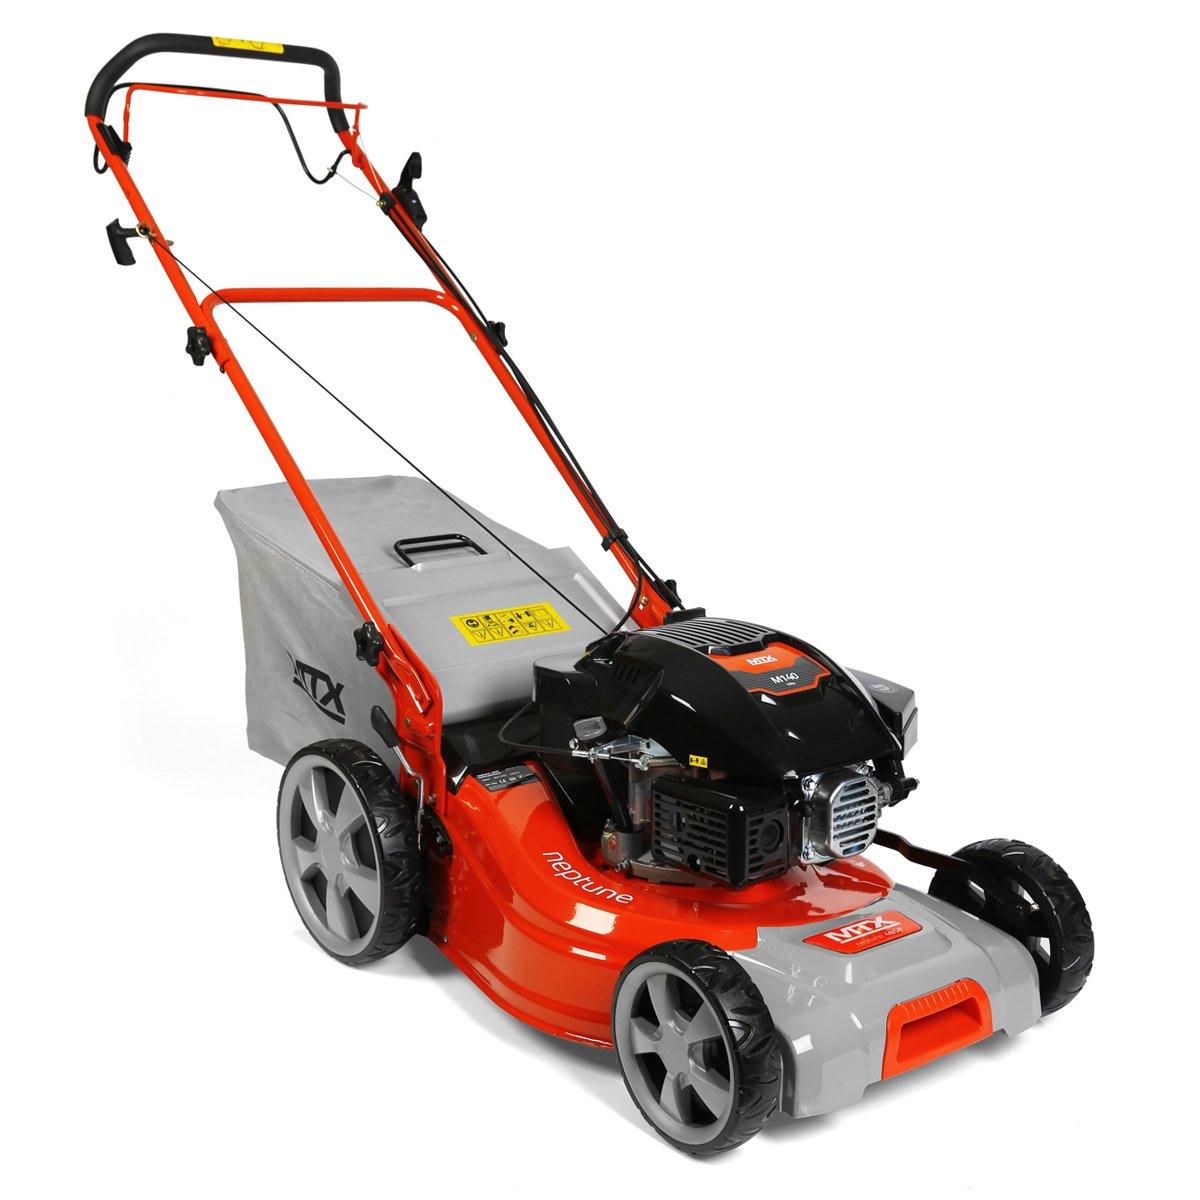 Toro Self Propelled Lawn Mowers Mowdirect Lawnmowers